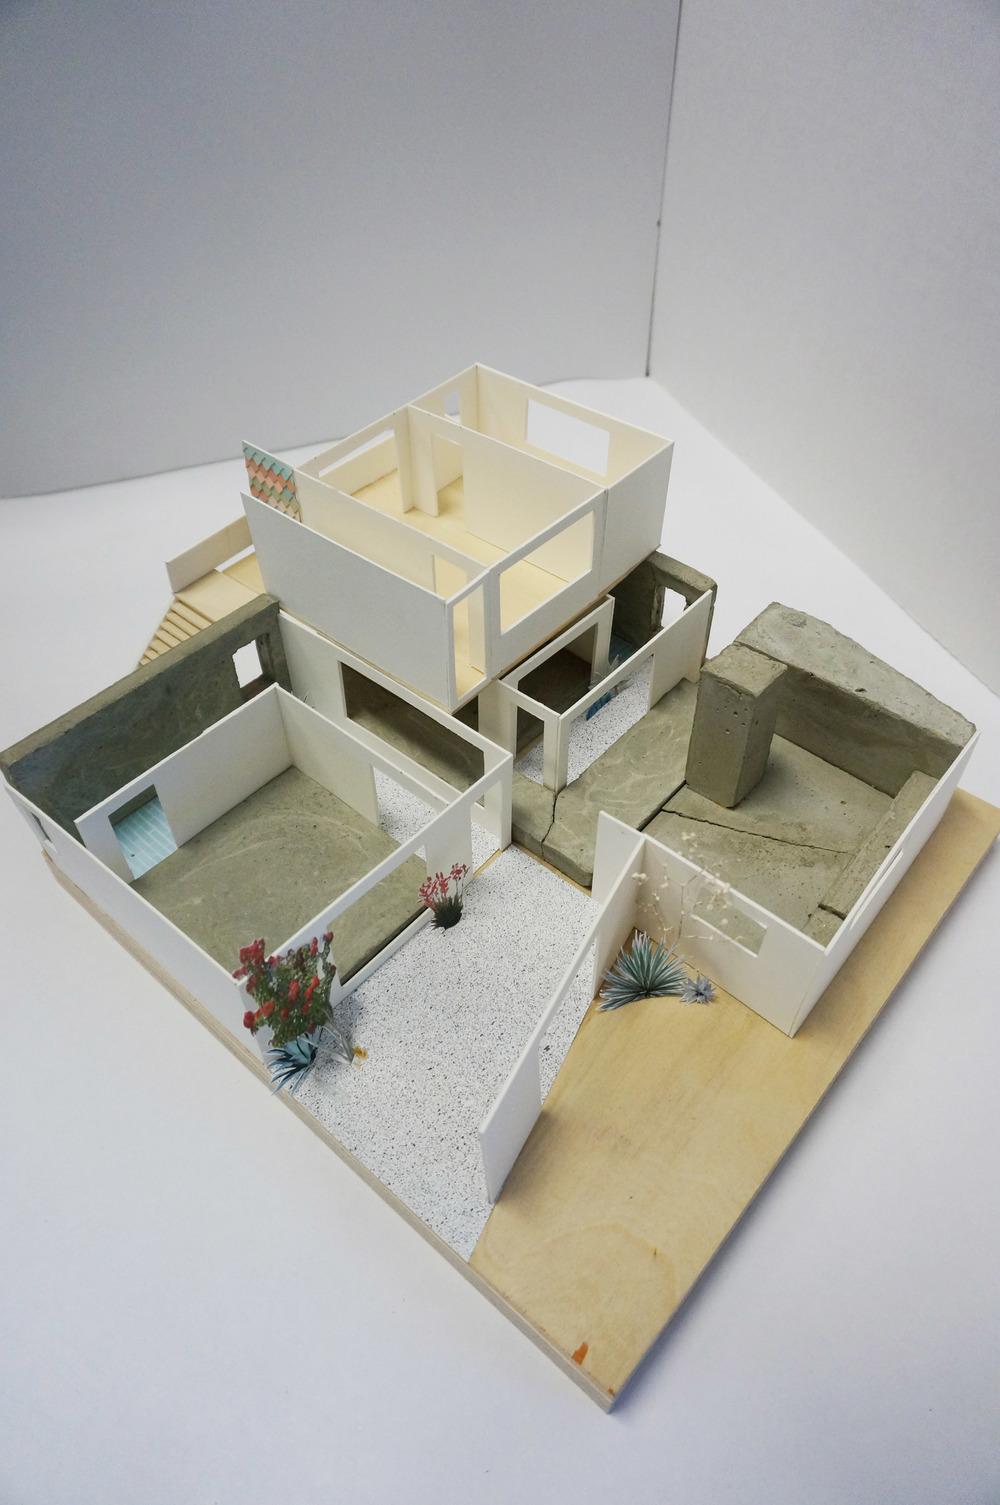 Unit Model 2_1-4 Scale_3.jpg